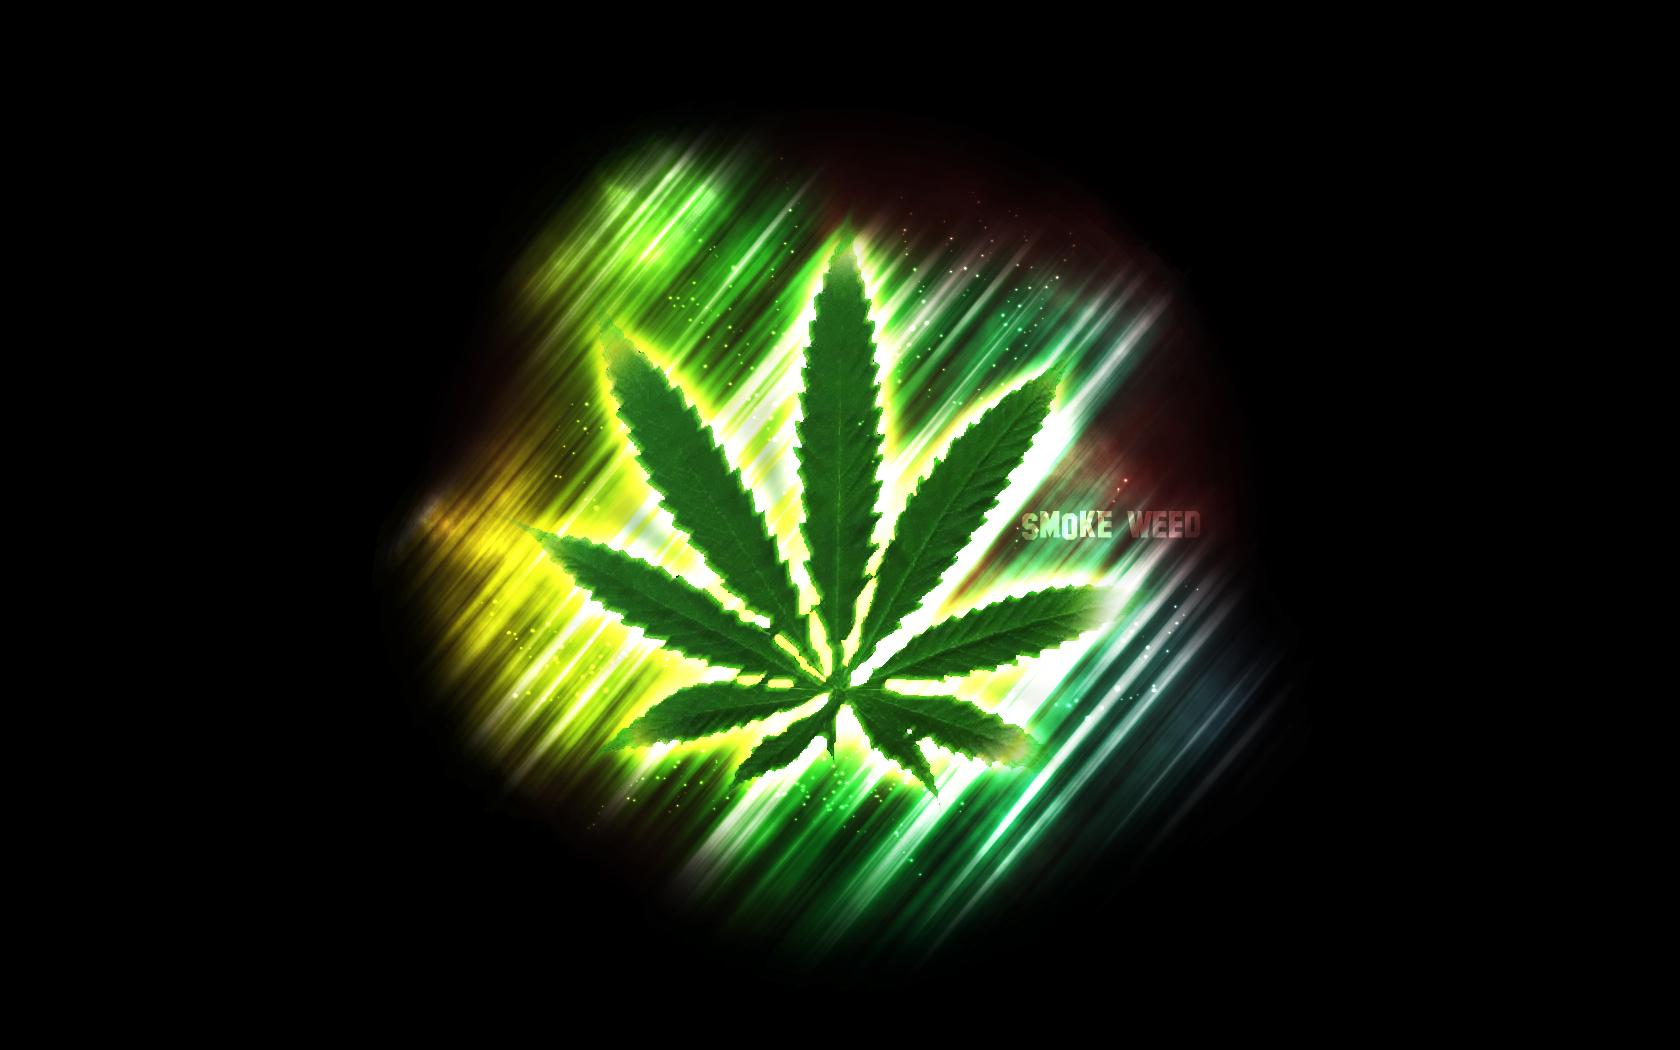 13 PSD Smoke Weed Images